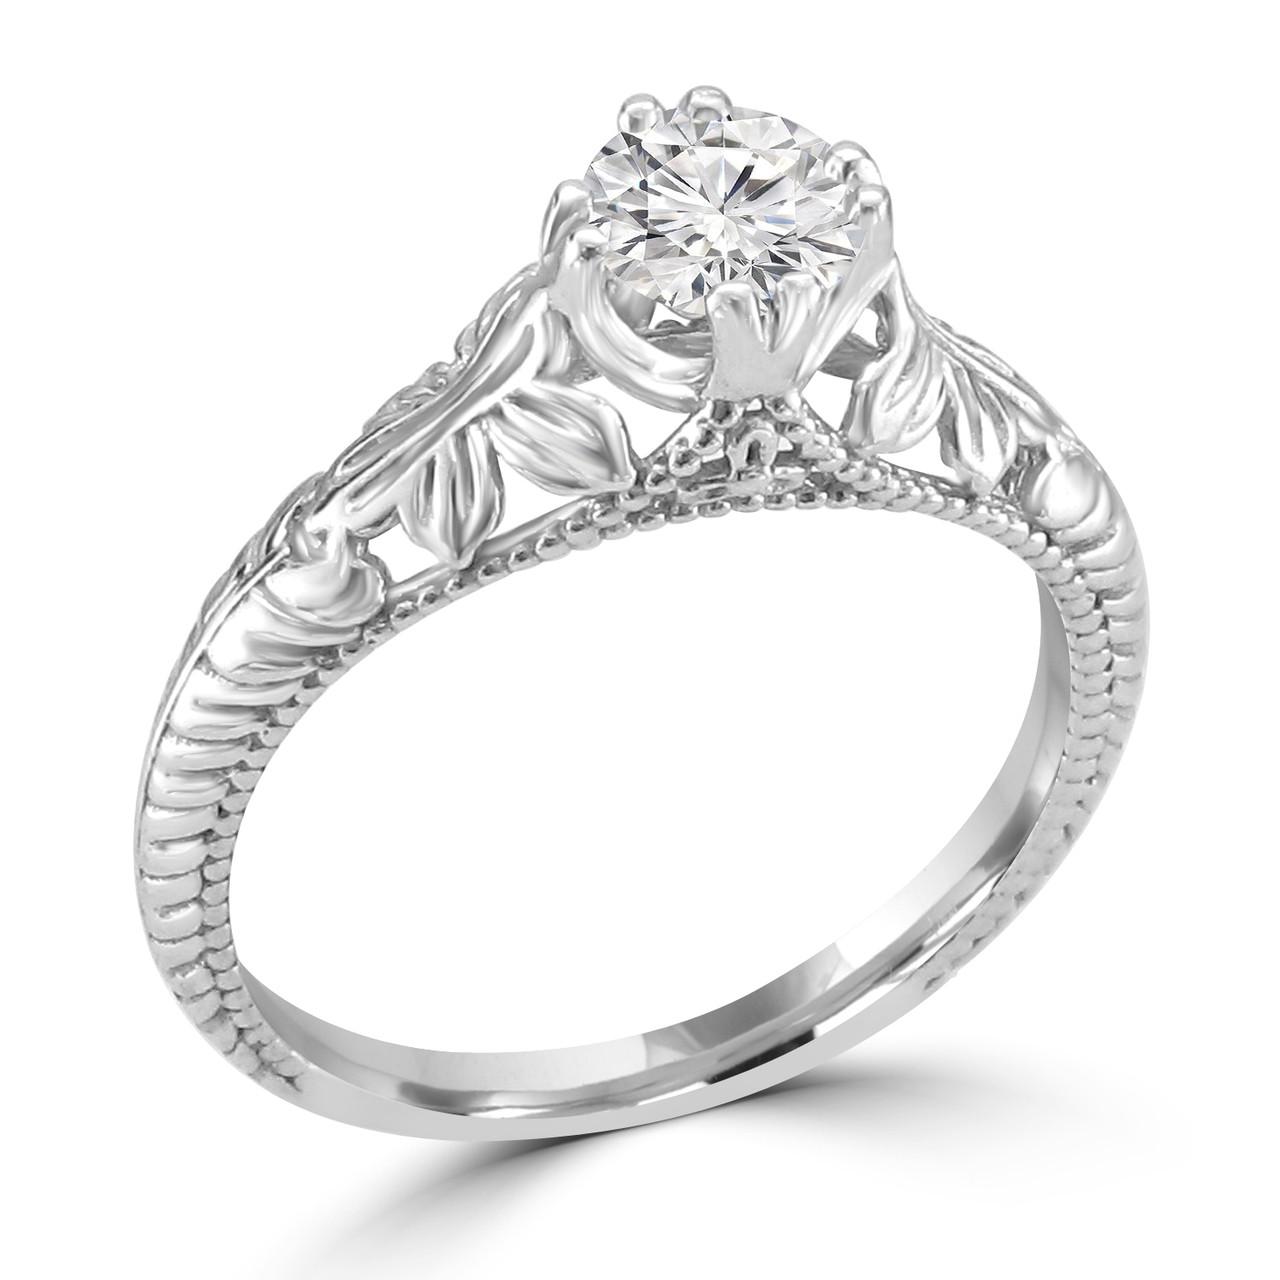 14K White Gold Vintage Inspired Engagement Ring , Anisa Style